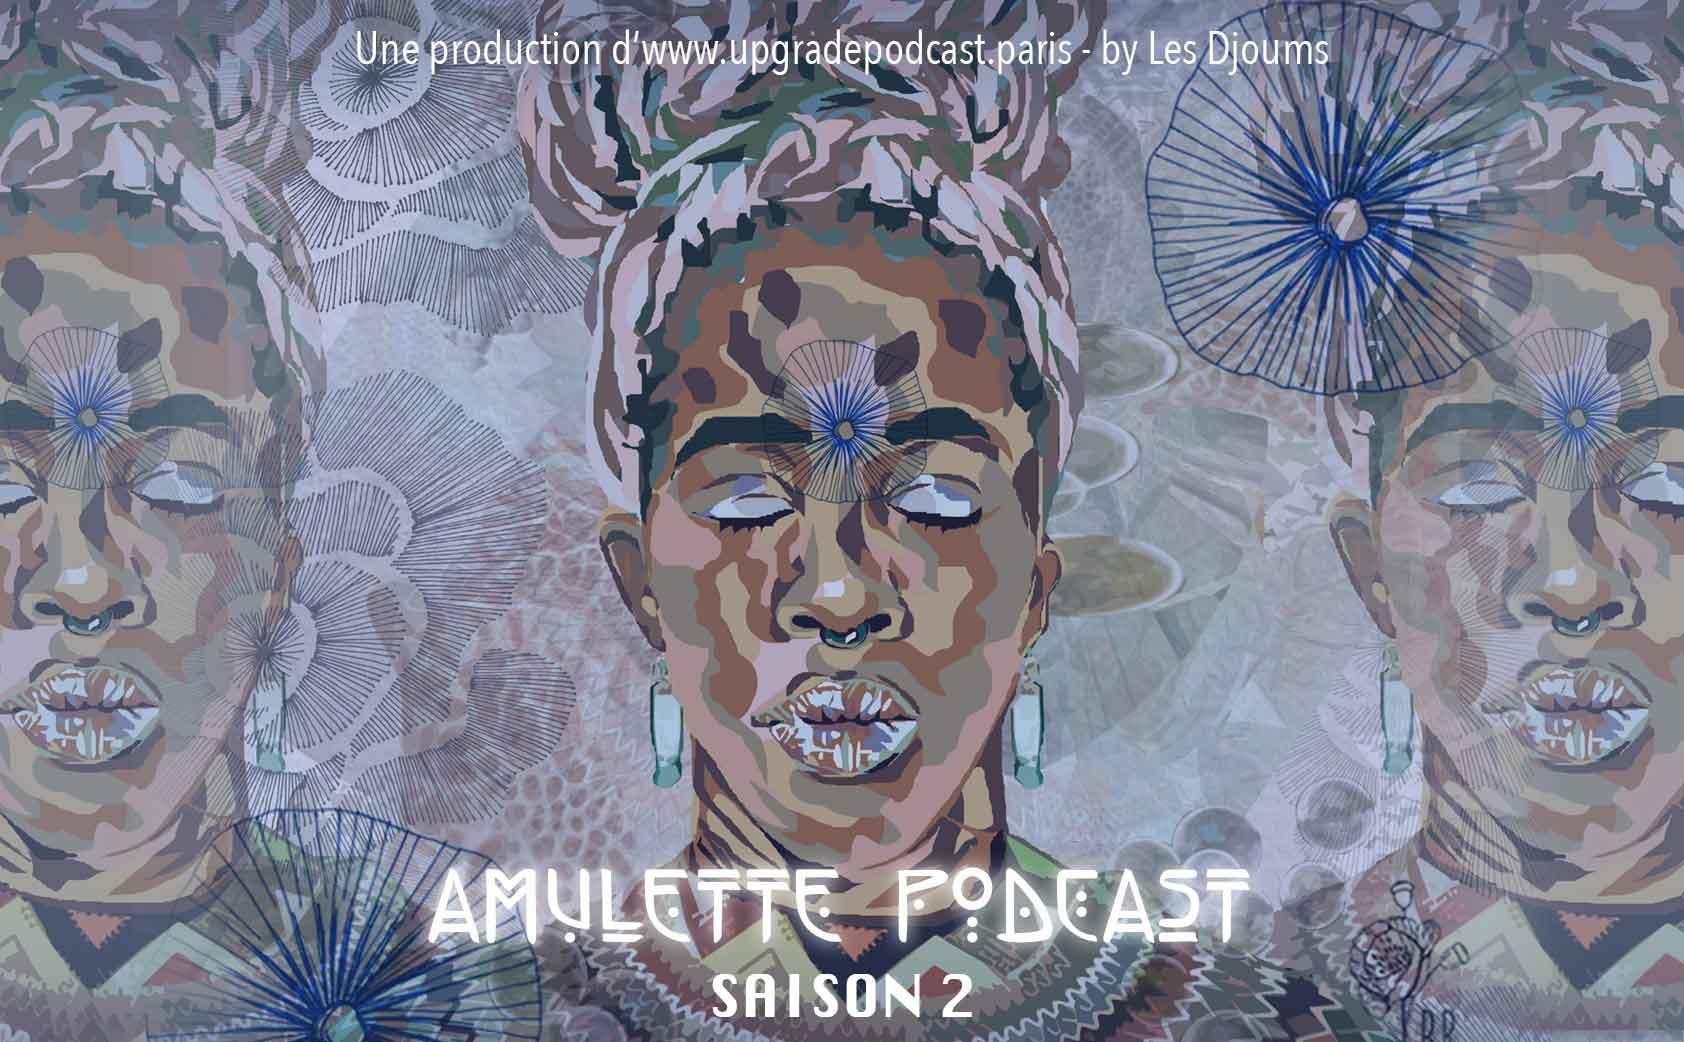 Amulette Podcast